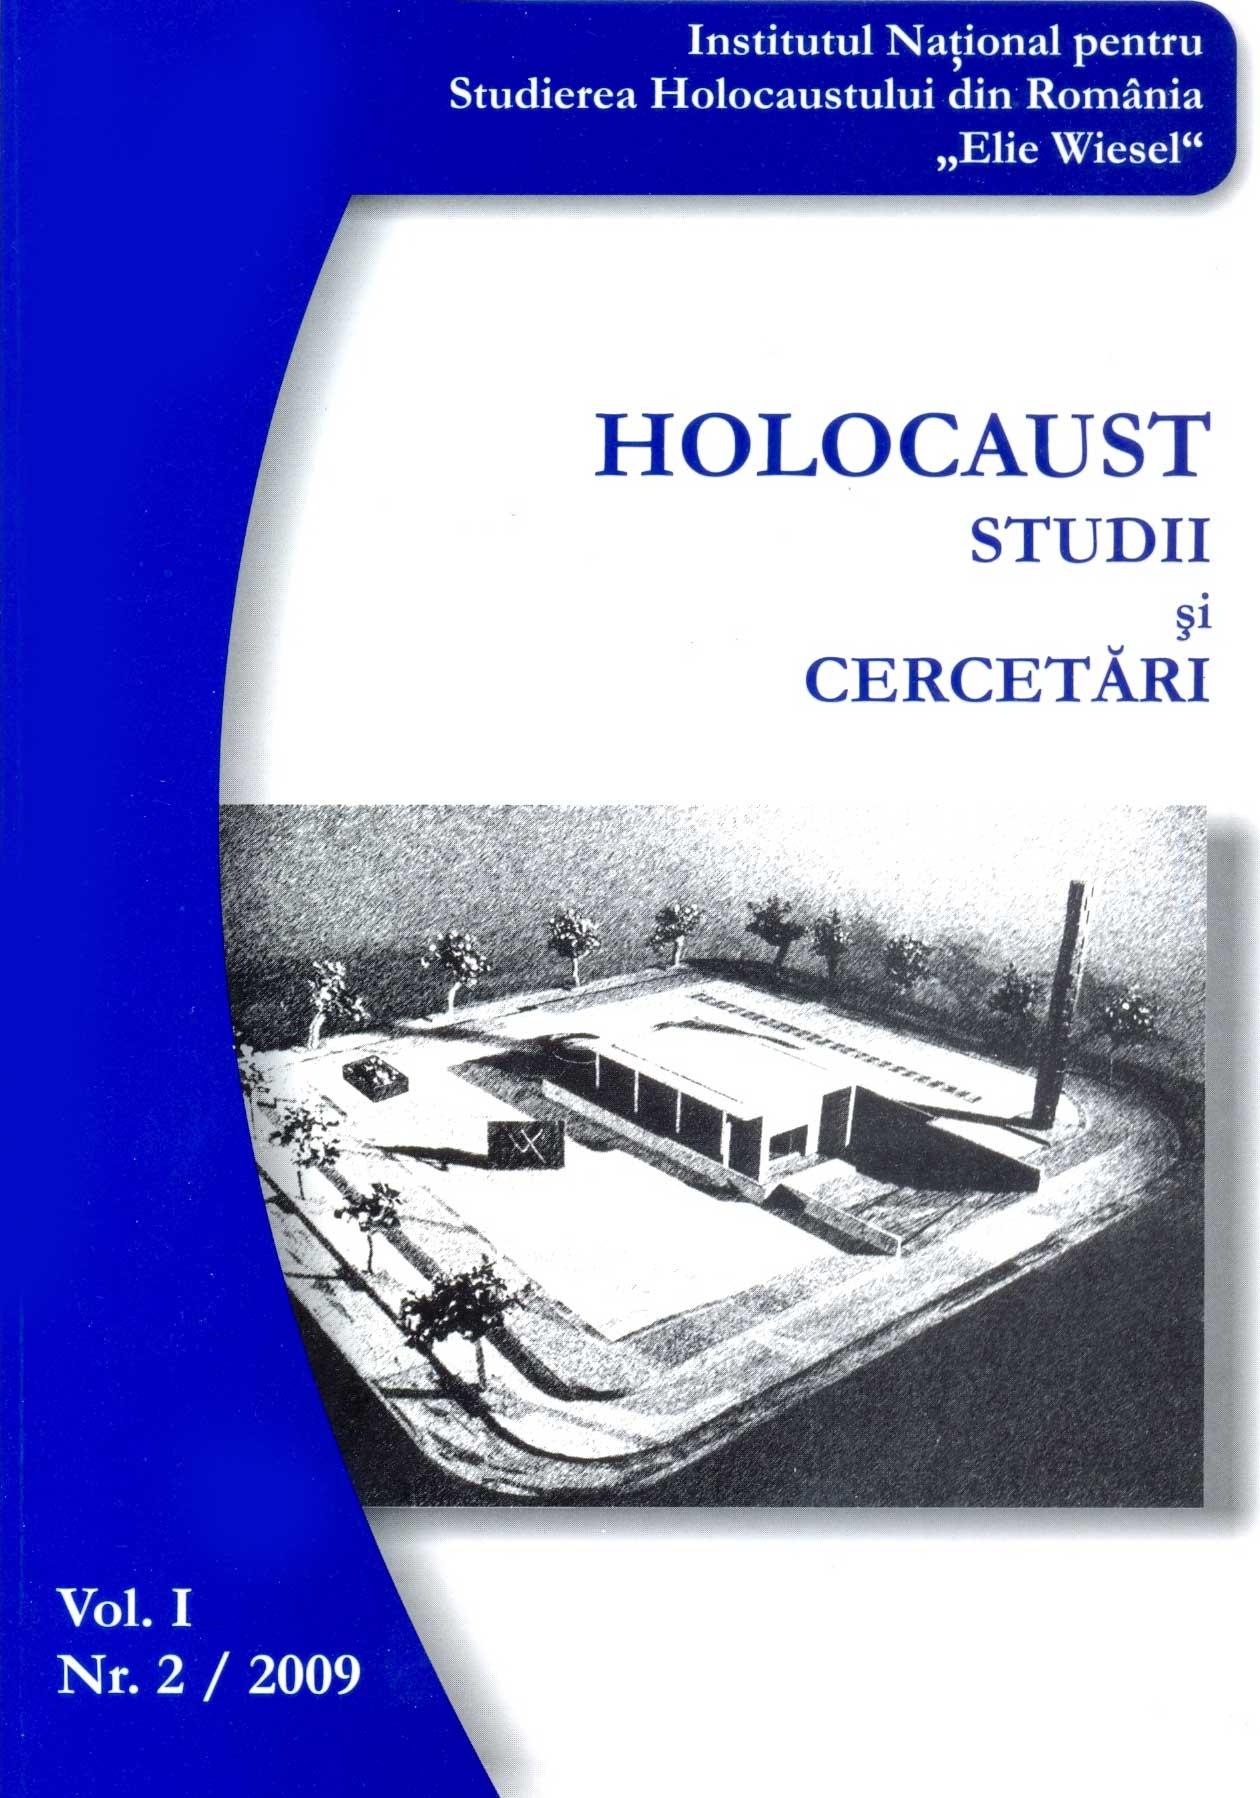 Revista INSHR Holocaust. Studii şi cercetări, vol. I, nr. 2/2009